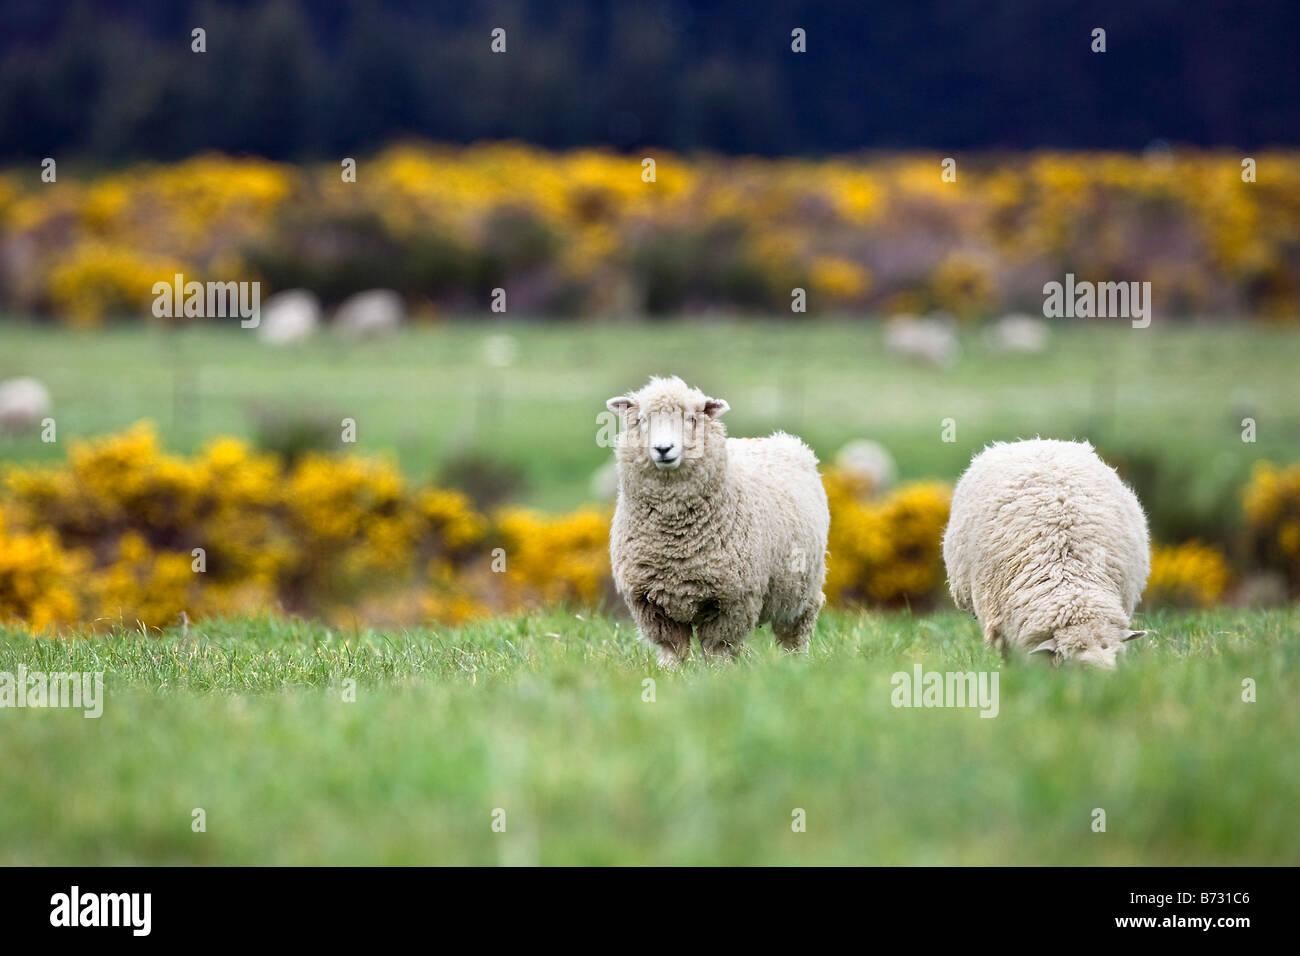 New Zealand, South Island, Kingston near Queenstown. Sheep. Stock Photo